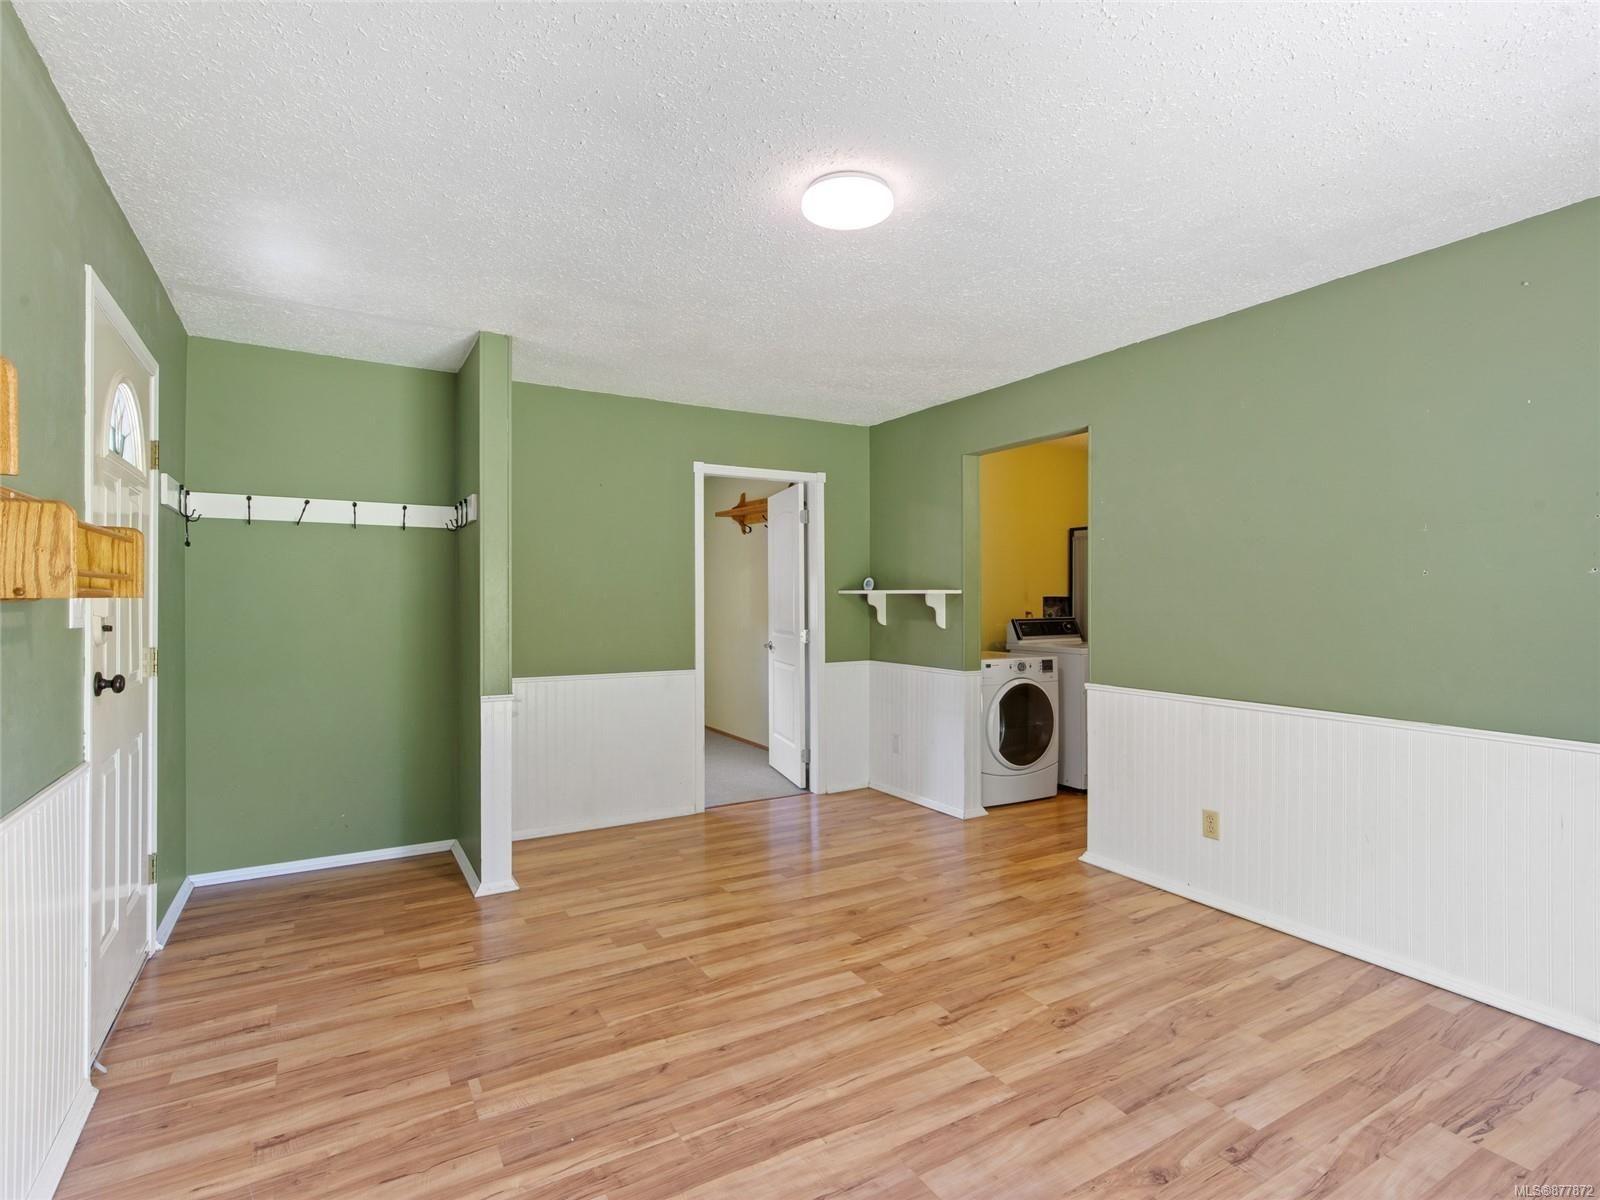 Photo 13: Photos: 7865 Wardrop Rd in : PA Port Alberni House for sale (Port Alberni)  : MLS®# 877872